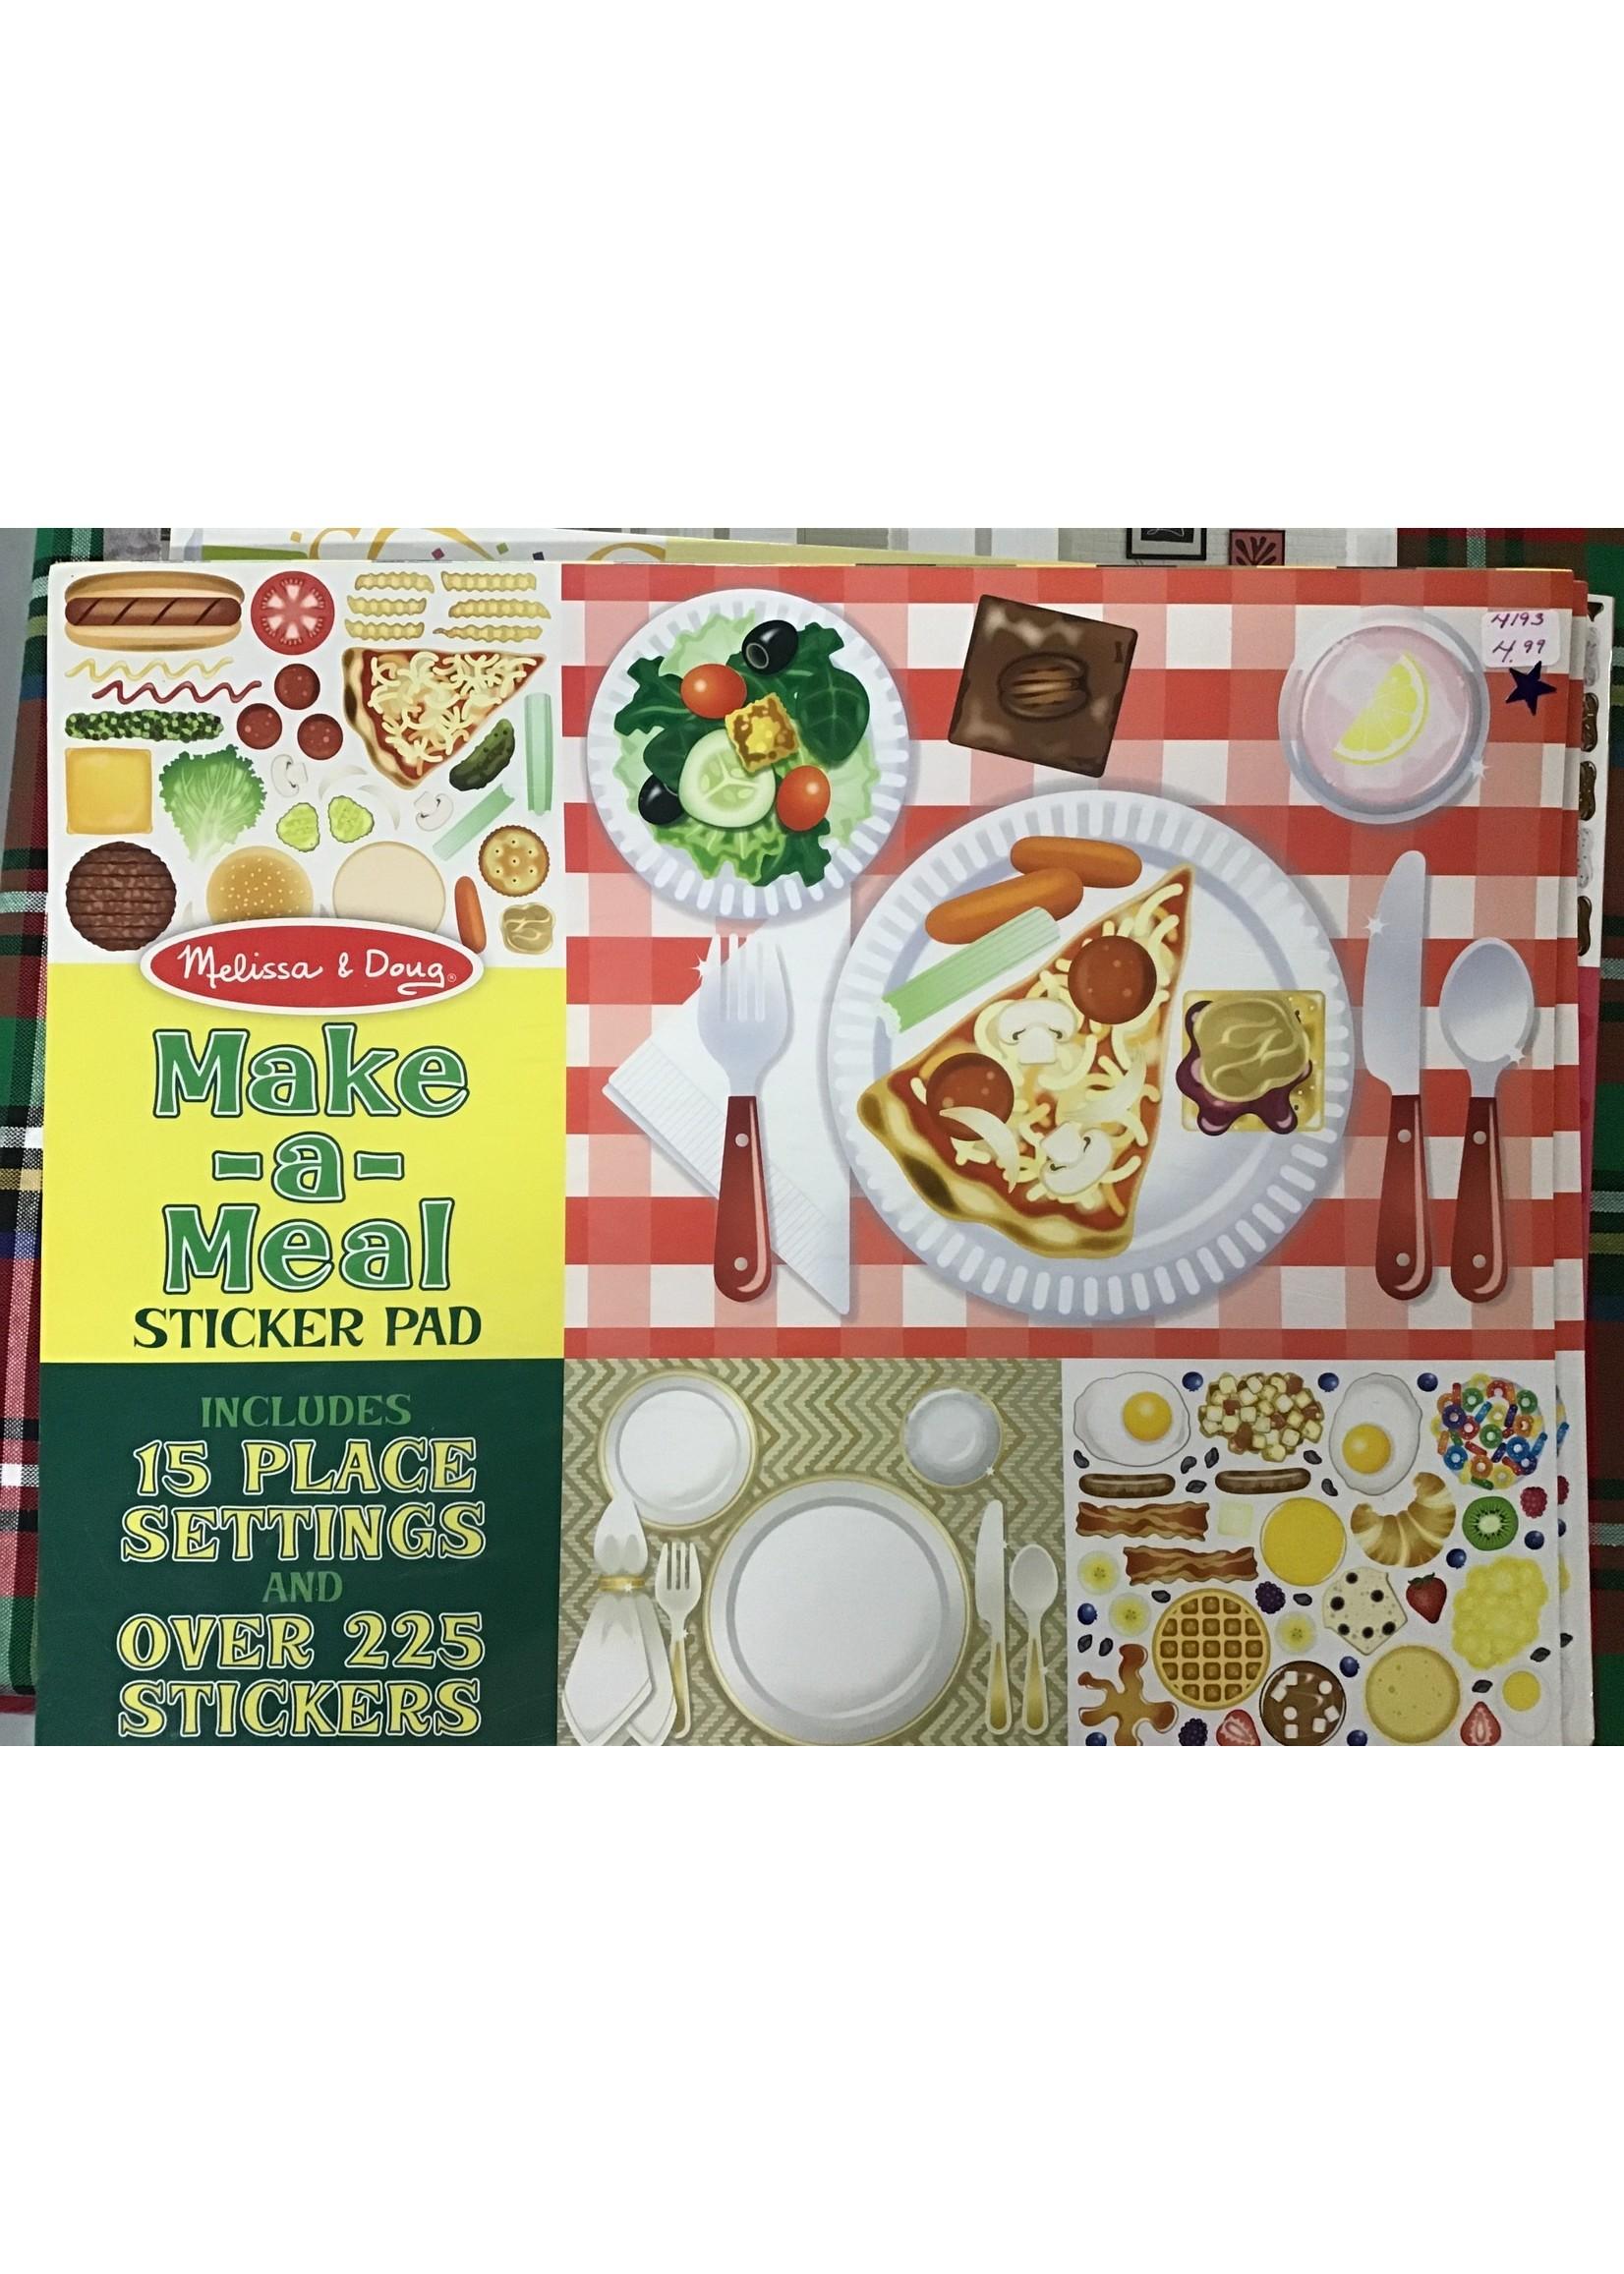 4193 MAKE-A-MEAL STICKER PAD